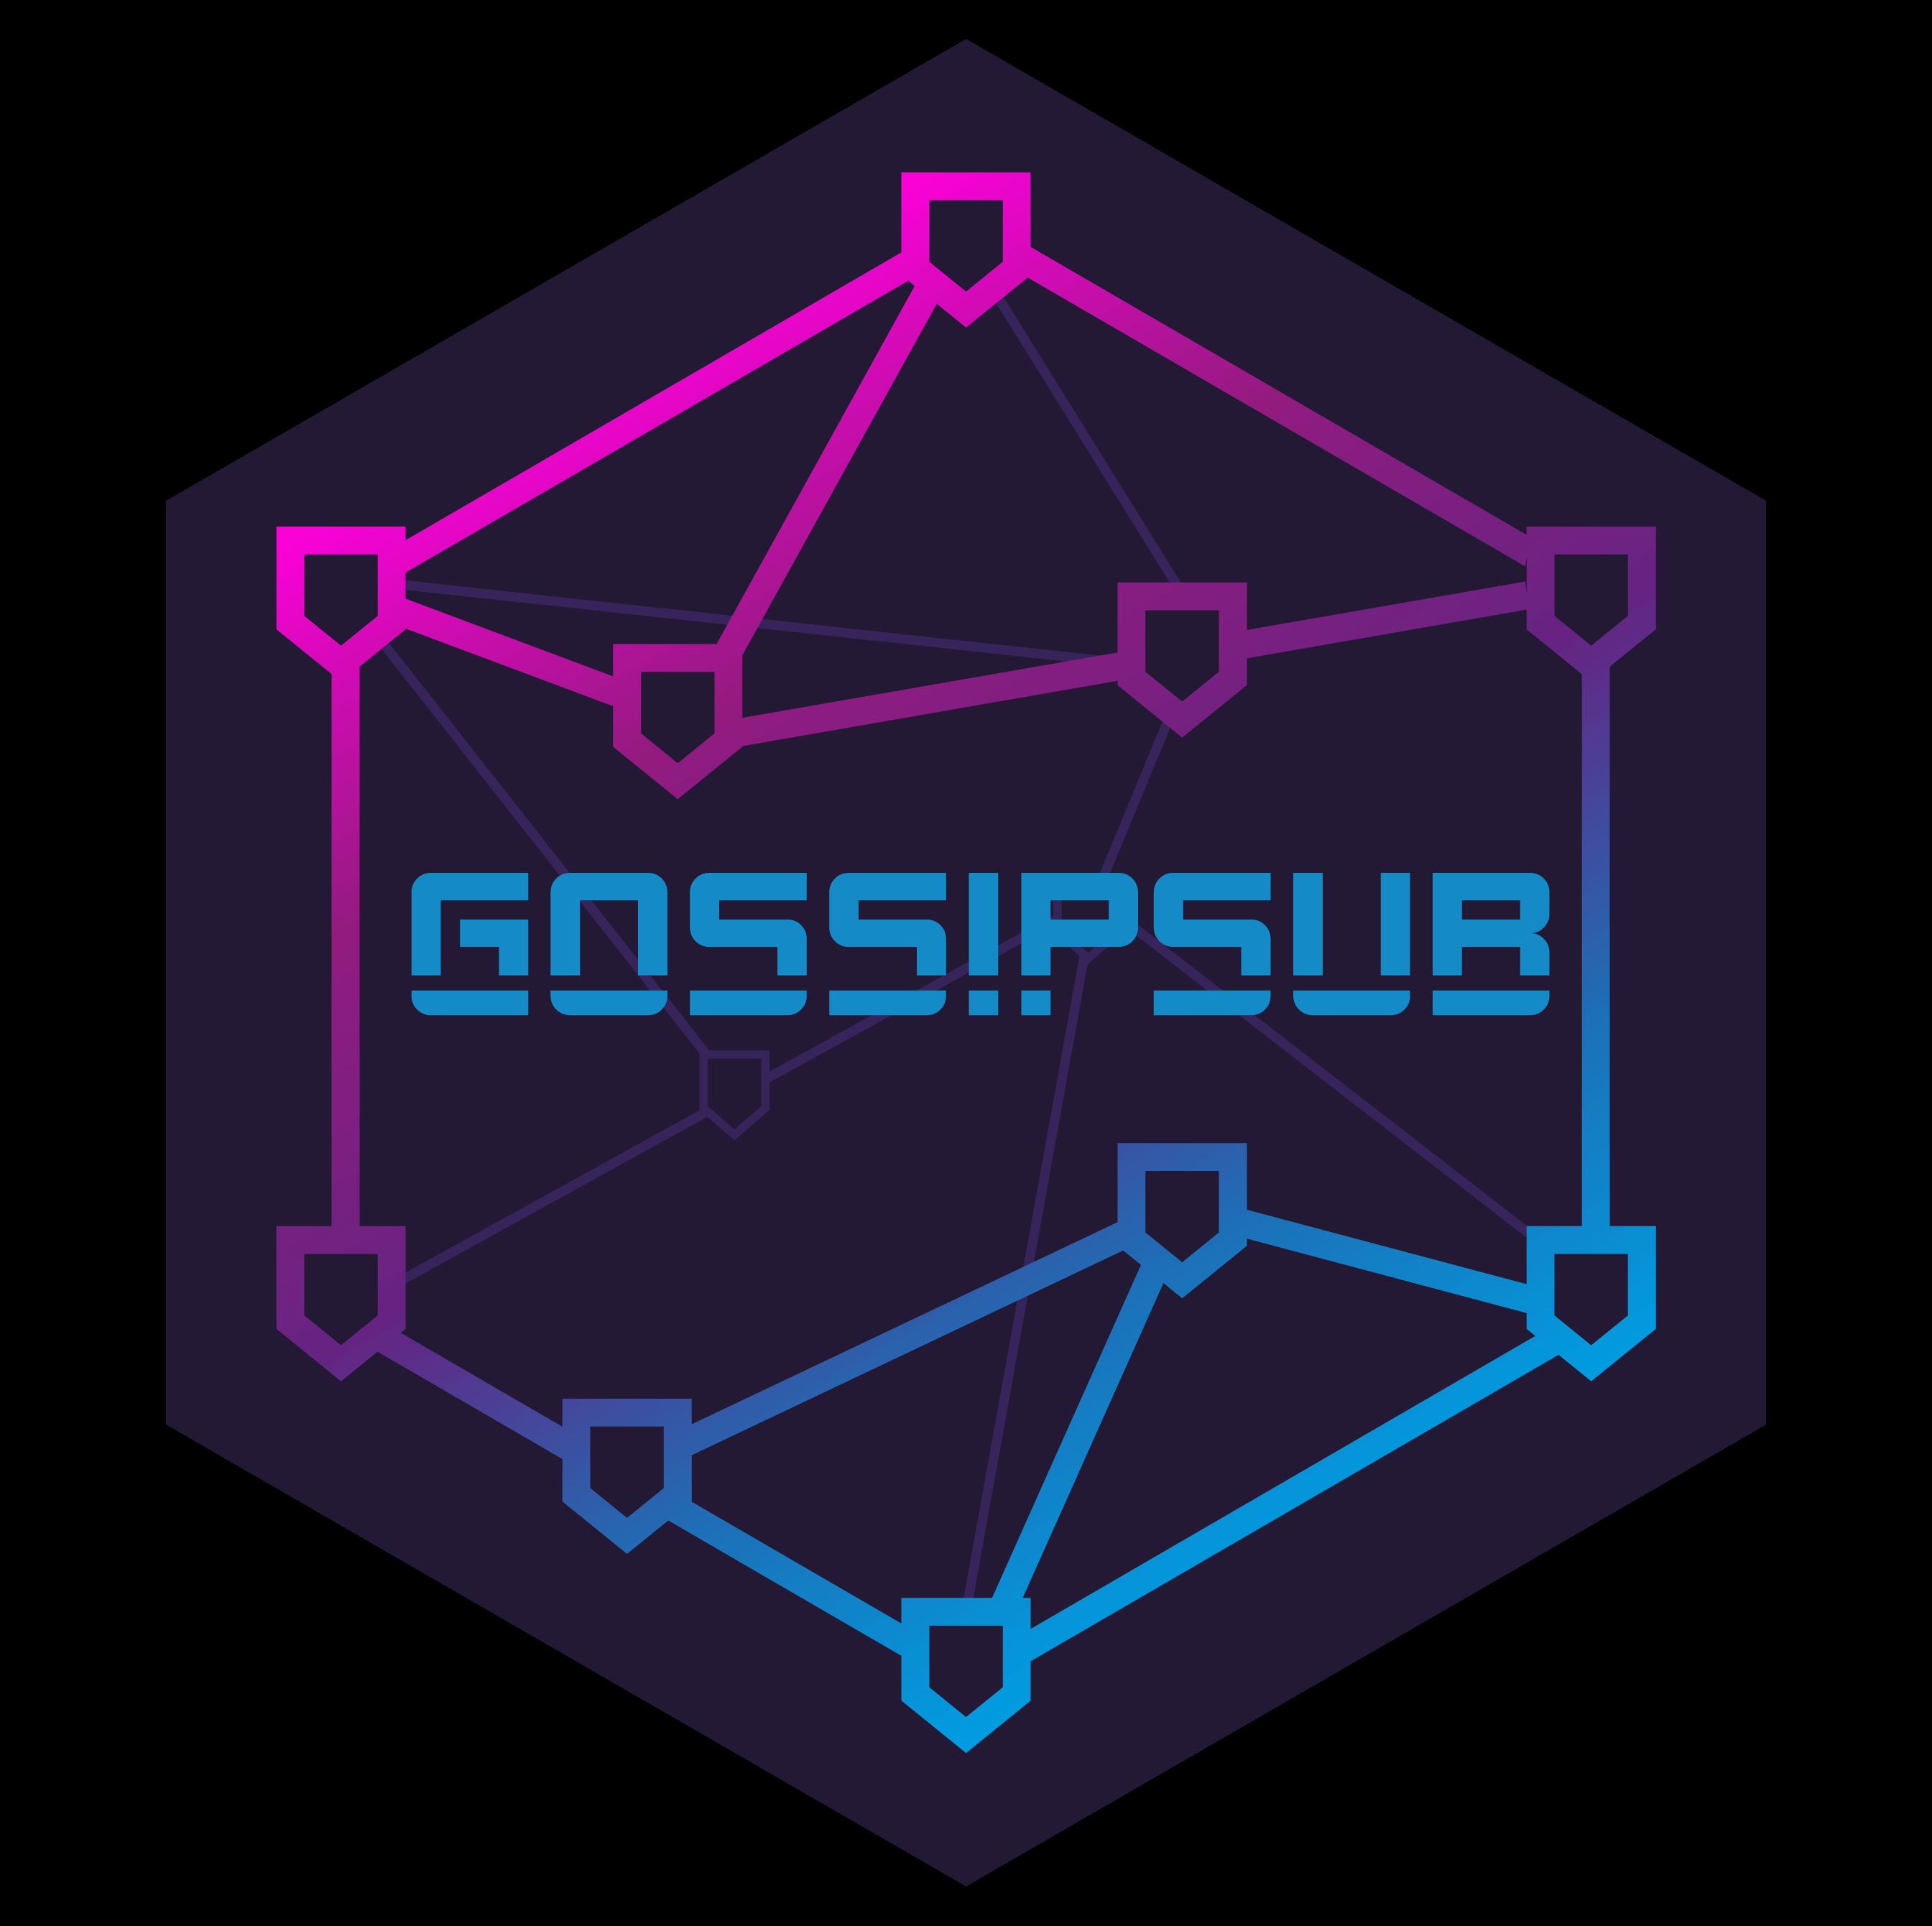 Gossipsub logo